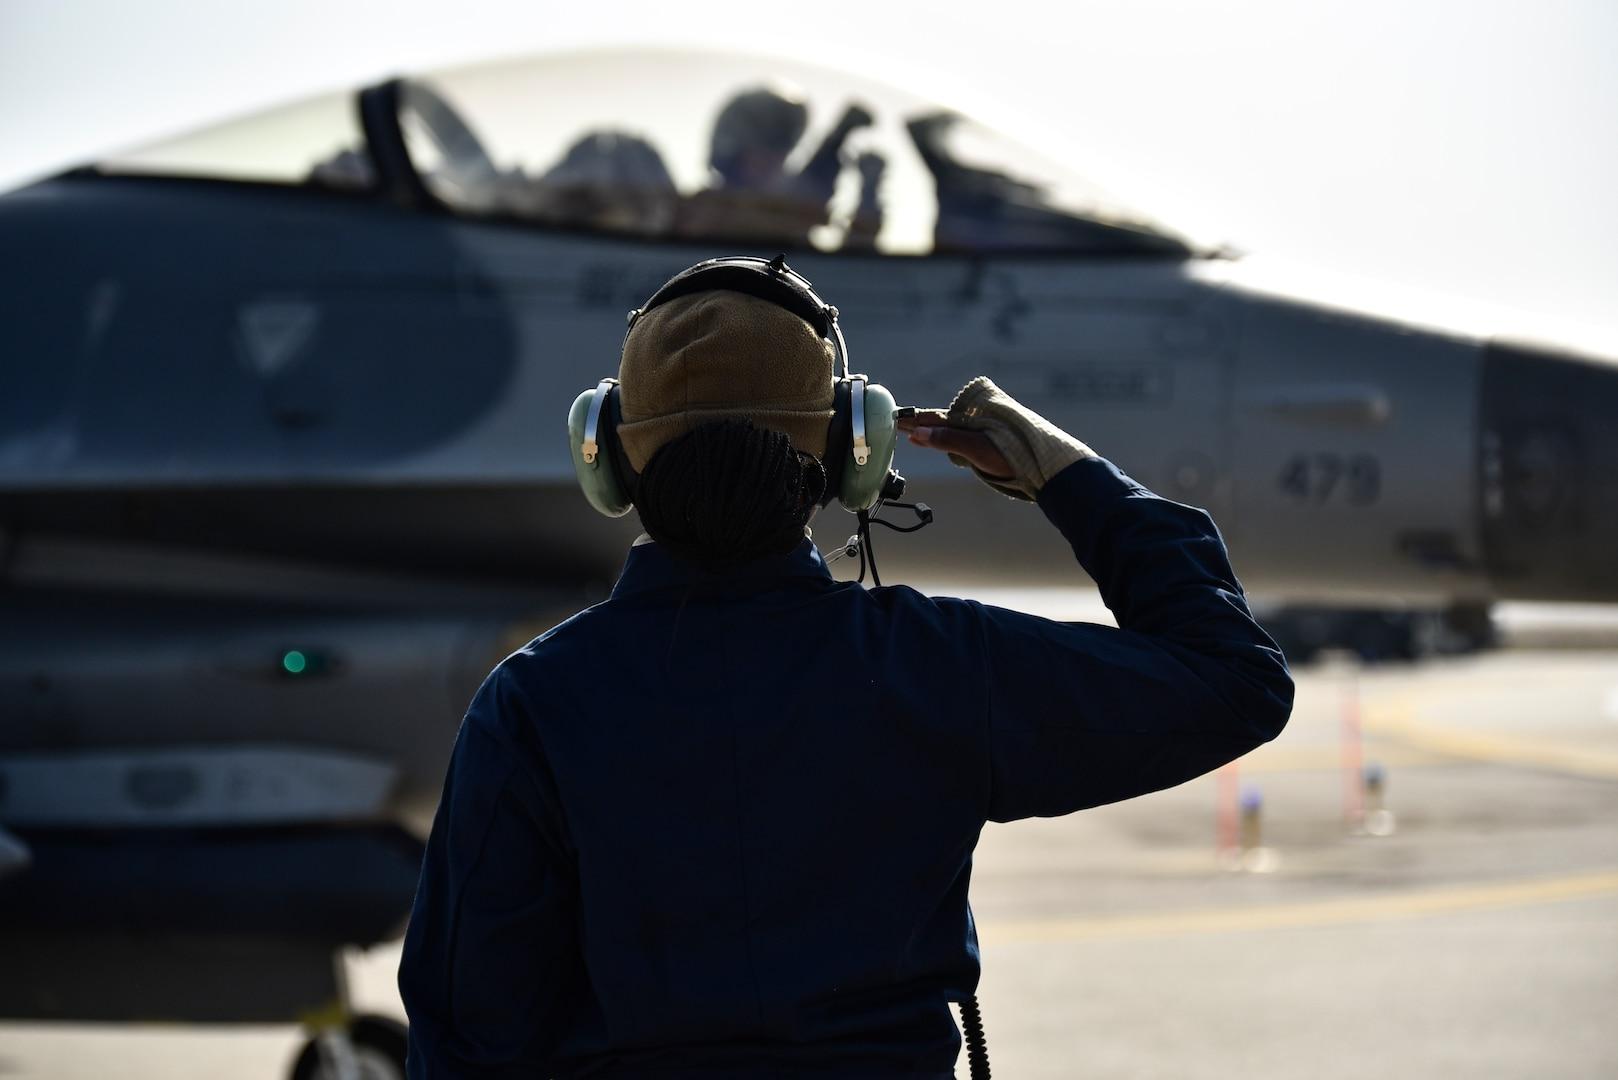 A crew chief salutes a pilot.